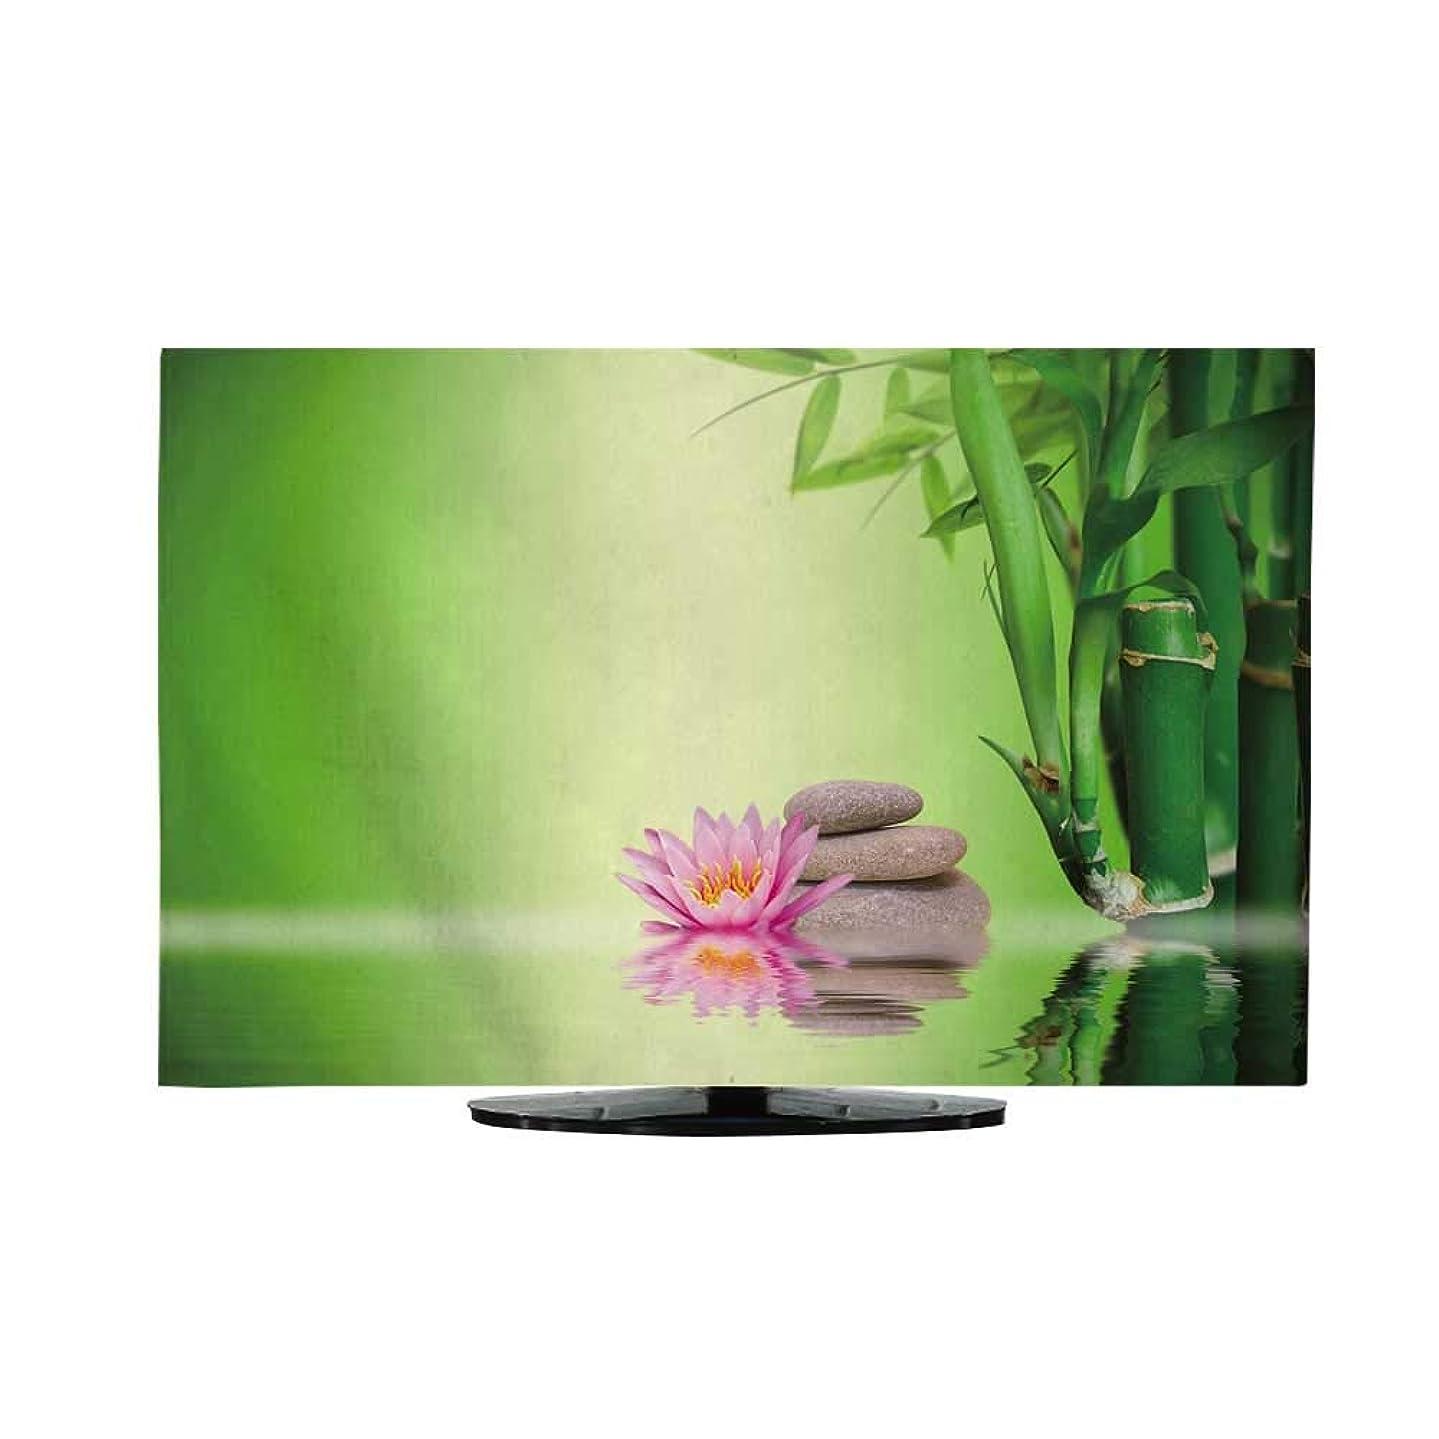 longbuyer 电视保护盖 Zen Basalt 石头和海盐 白色墙面 用于墙挂式电视